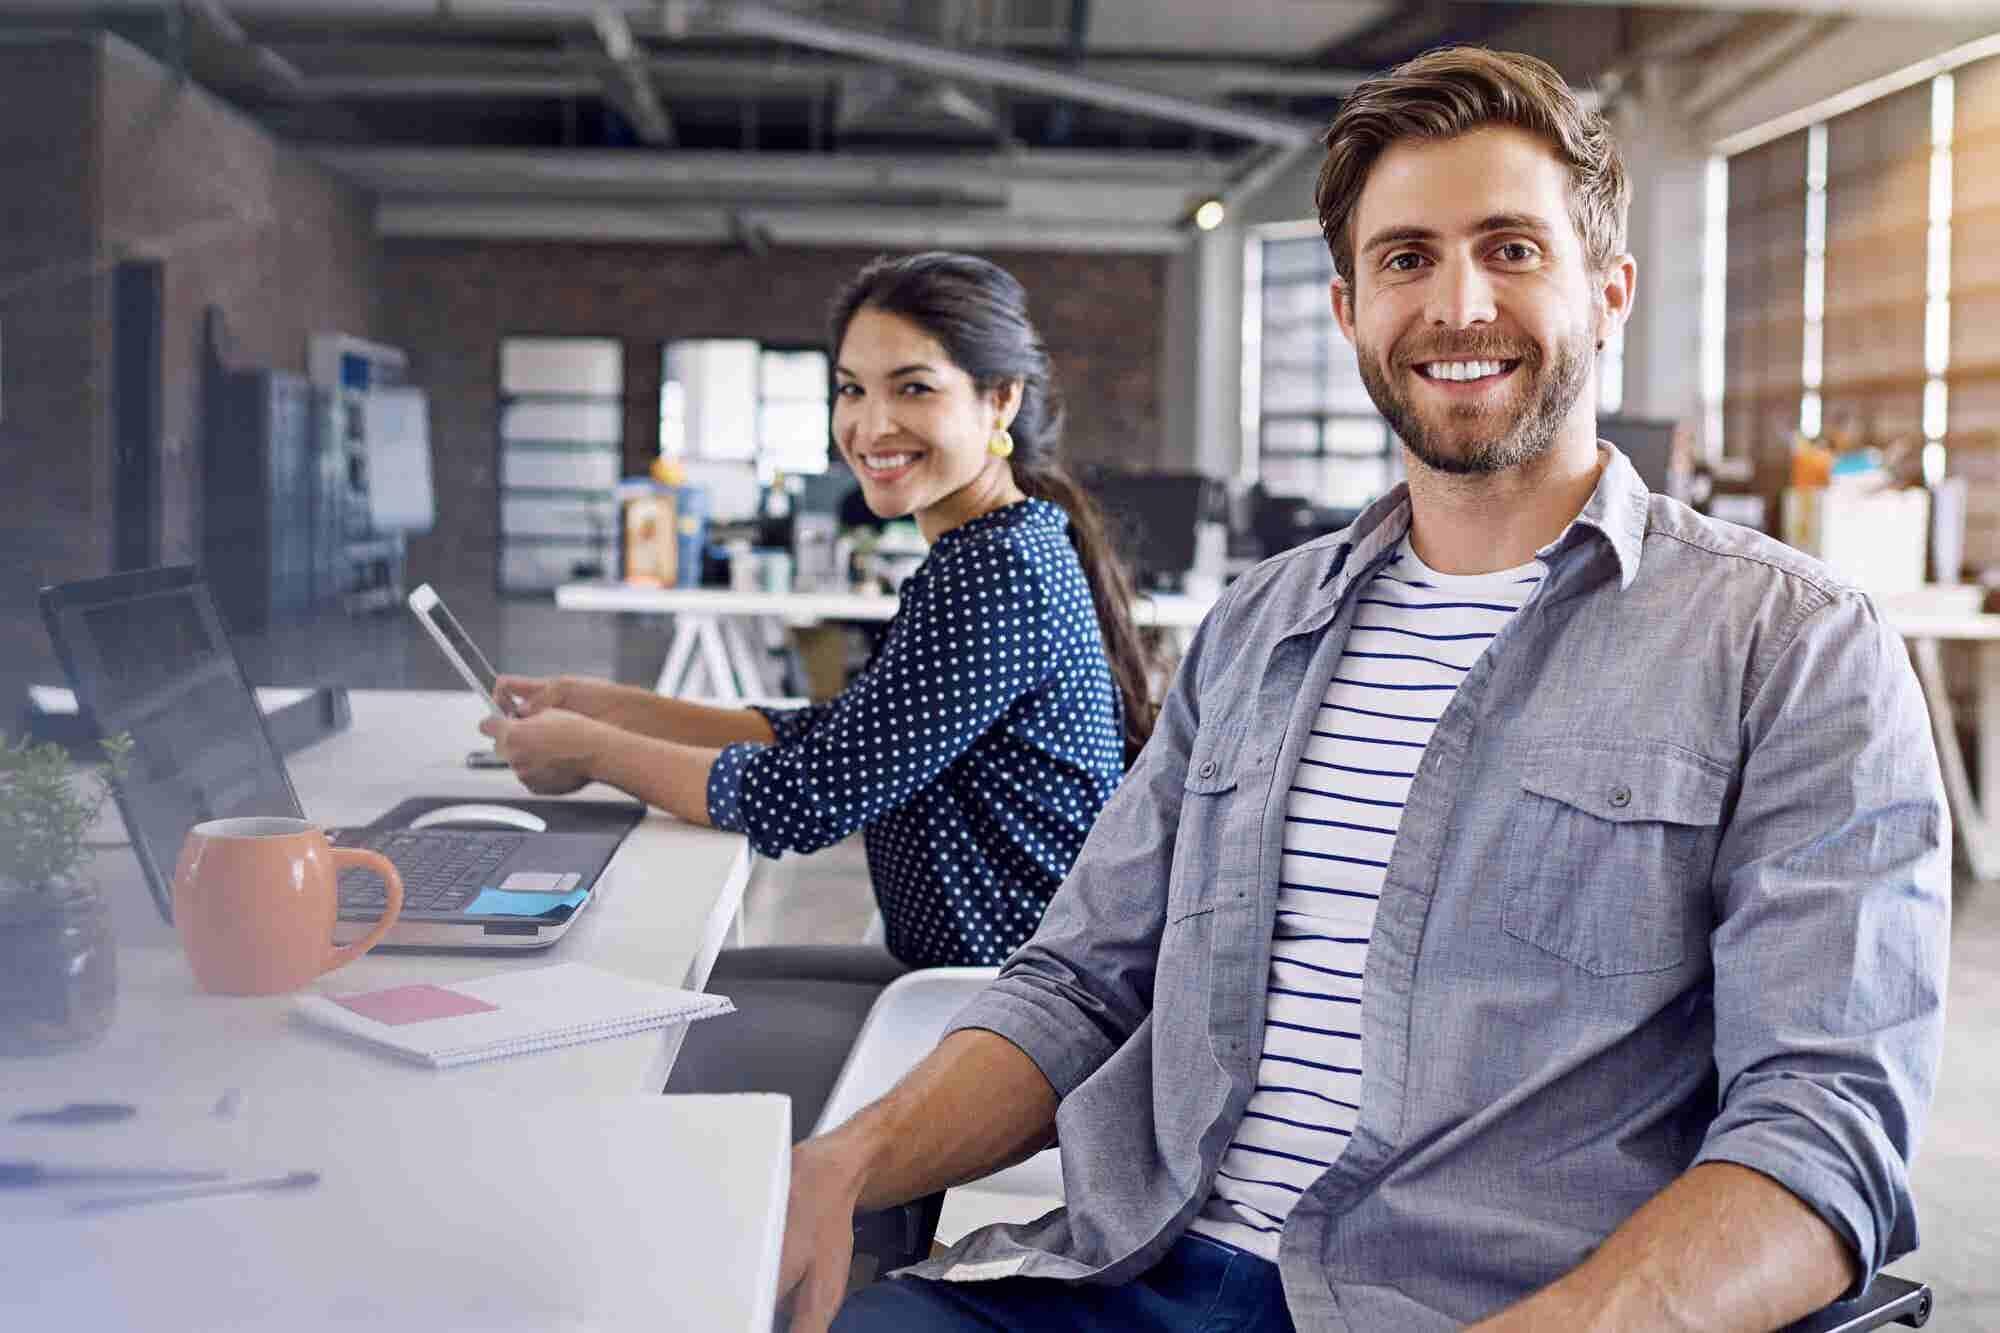 10 Online Courses Under $11 to Make You a Faster, Smarter Entrepreneur